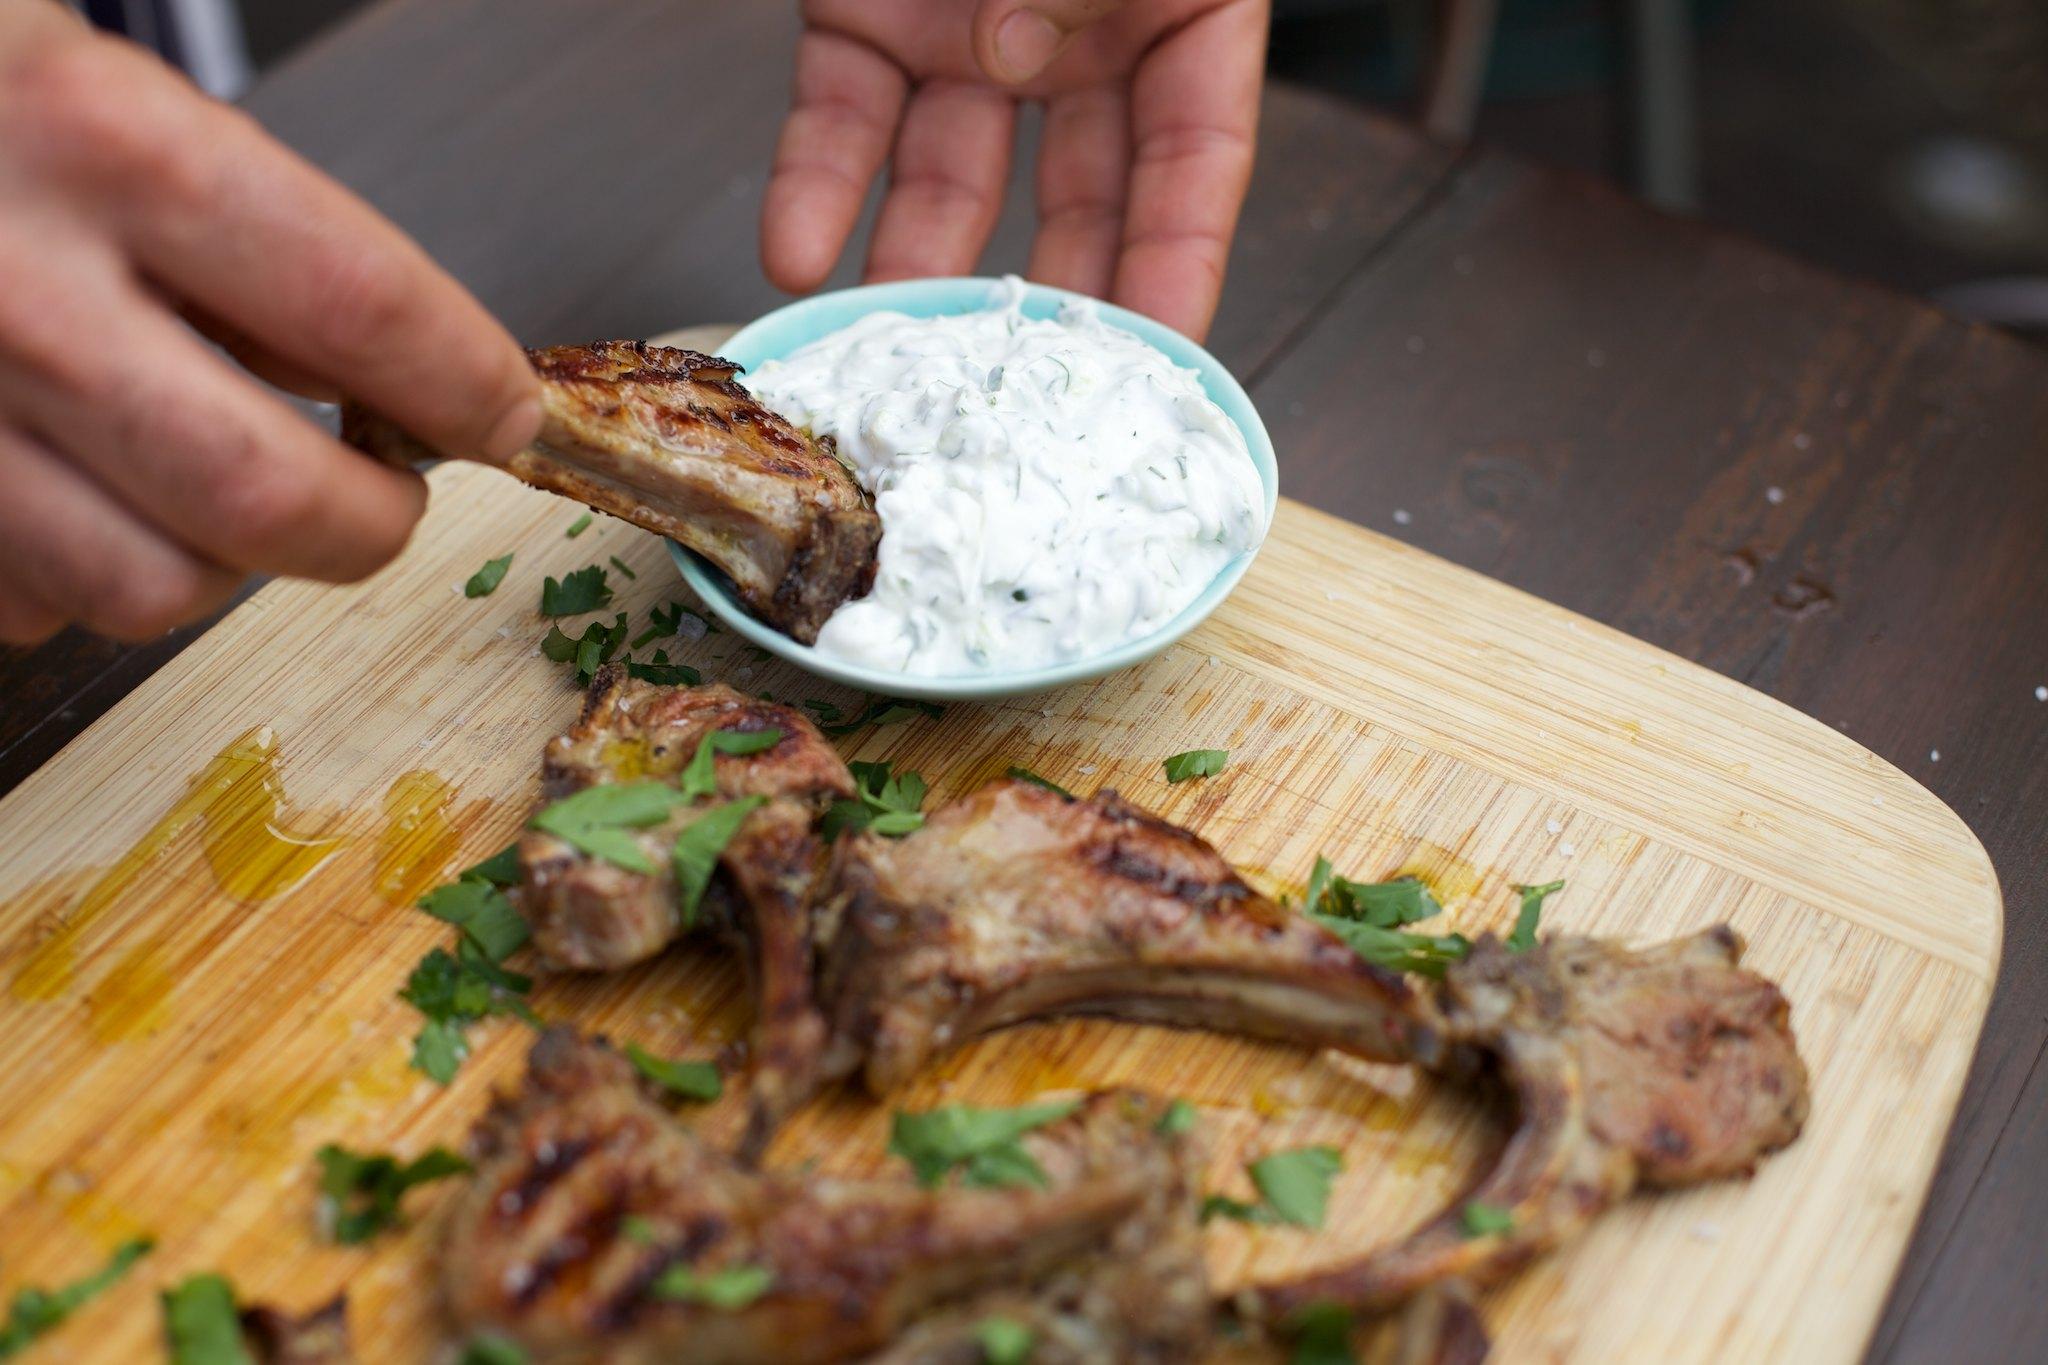 FAISAL' S DELICIOUS PAIDAKIA (BBQ LAMB CHOPS THE GREEK WAY)